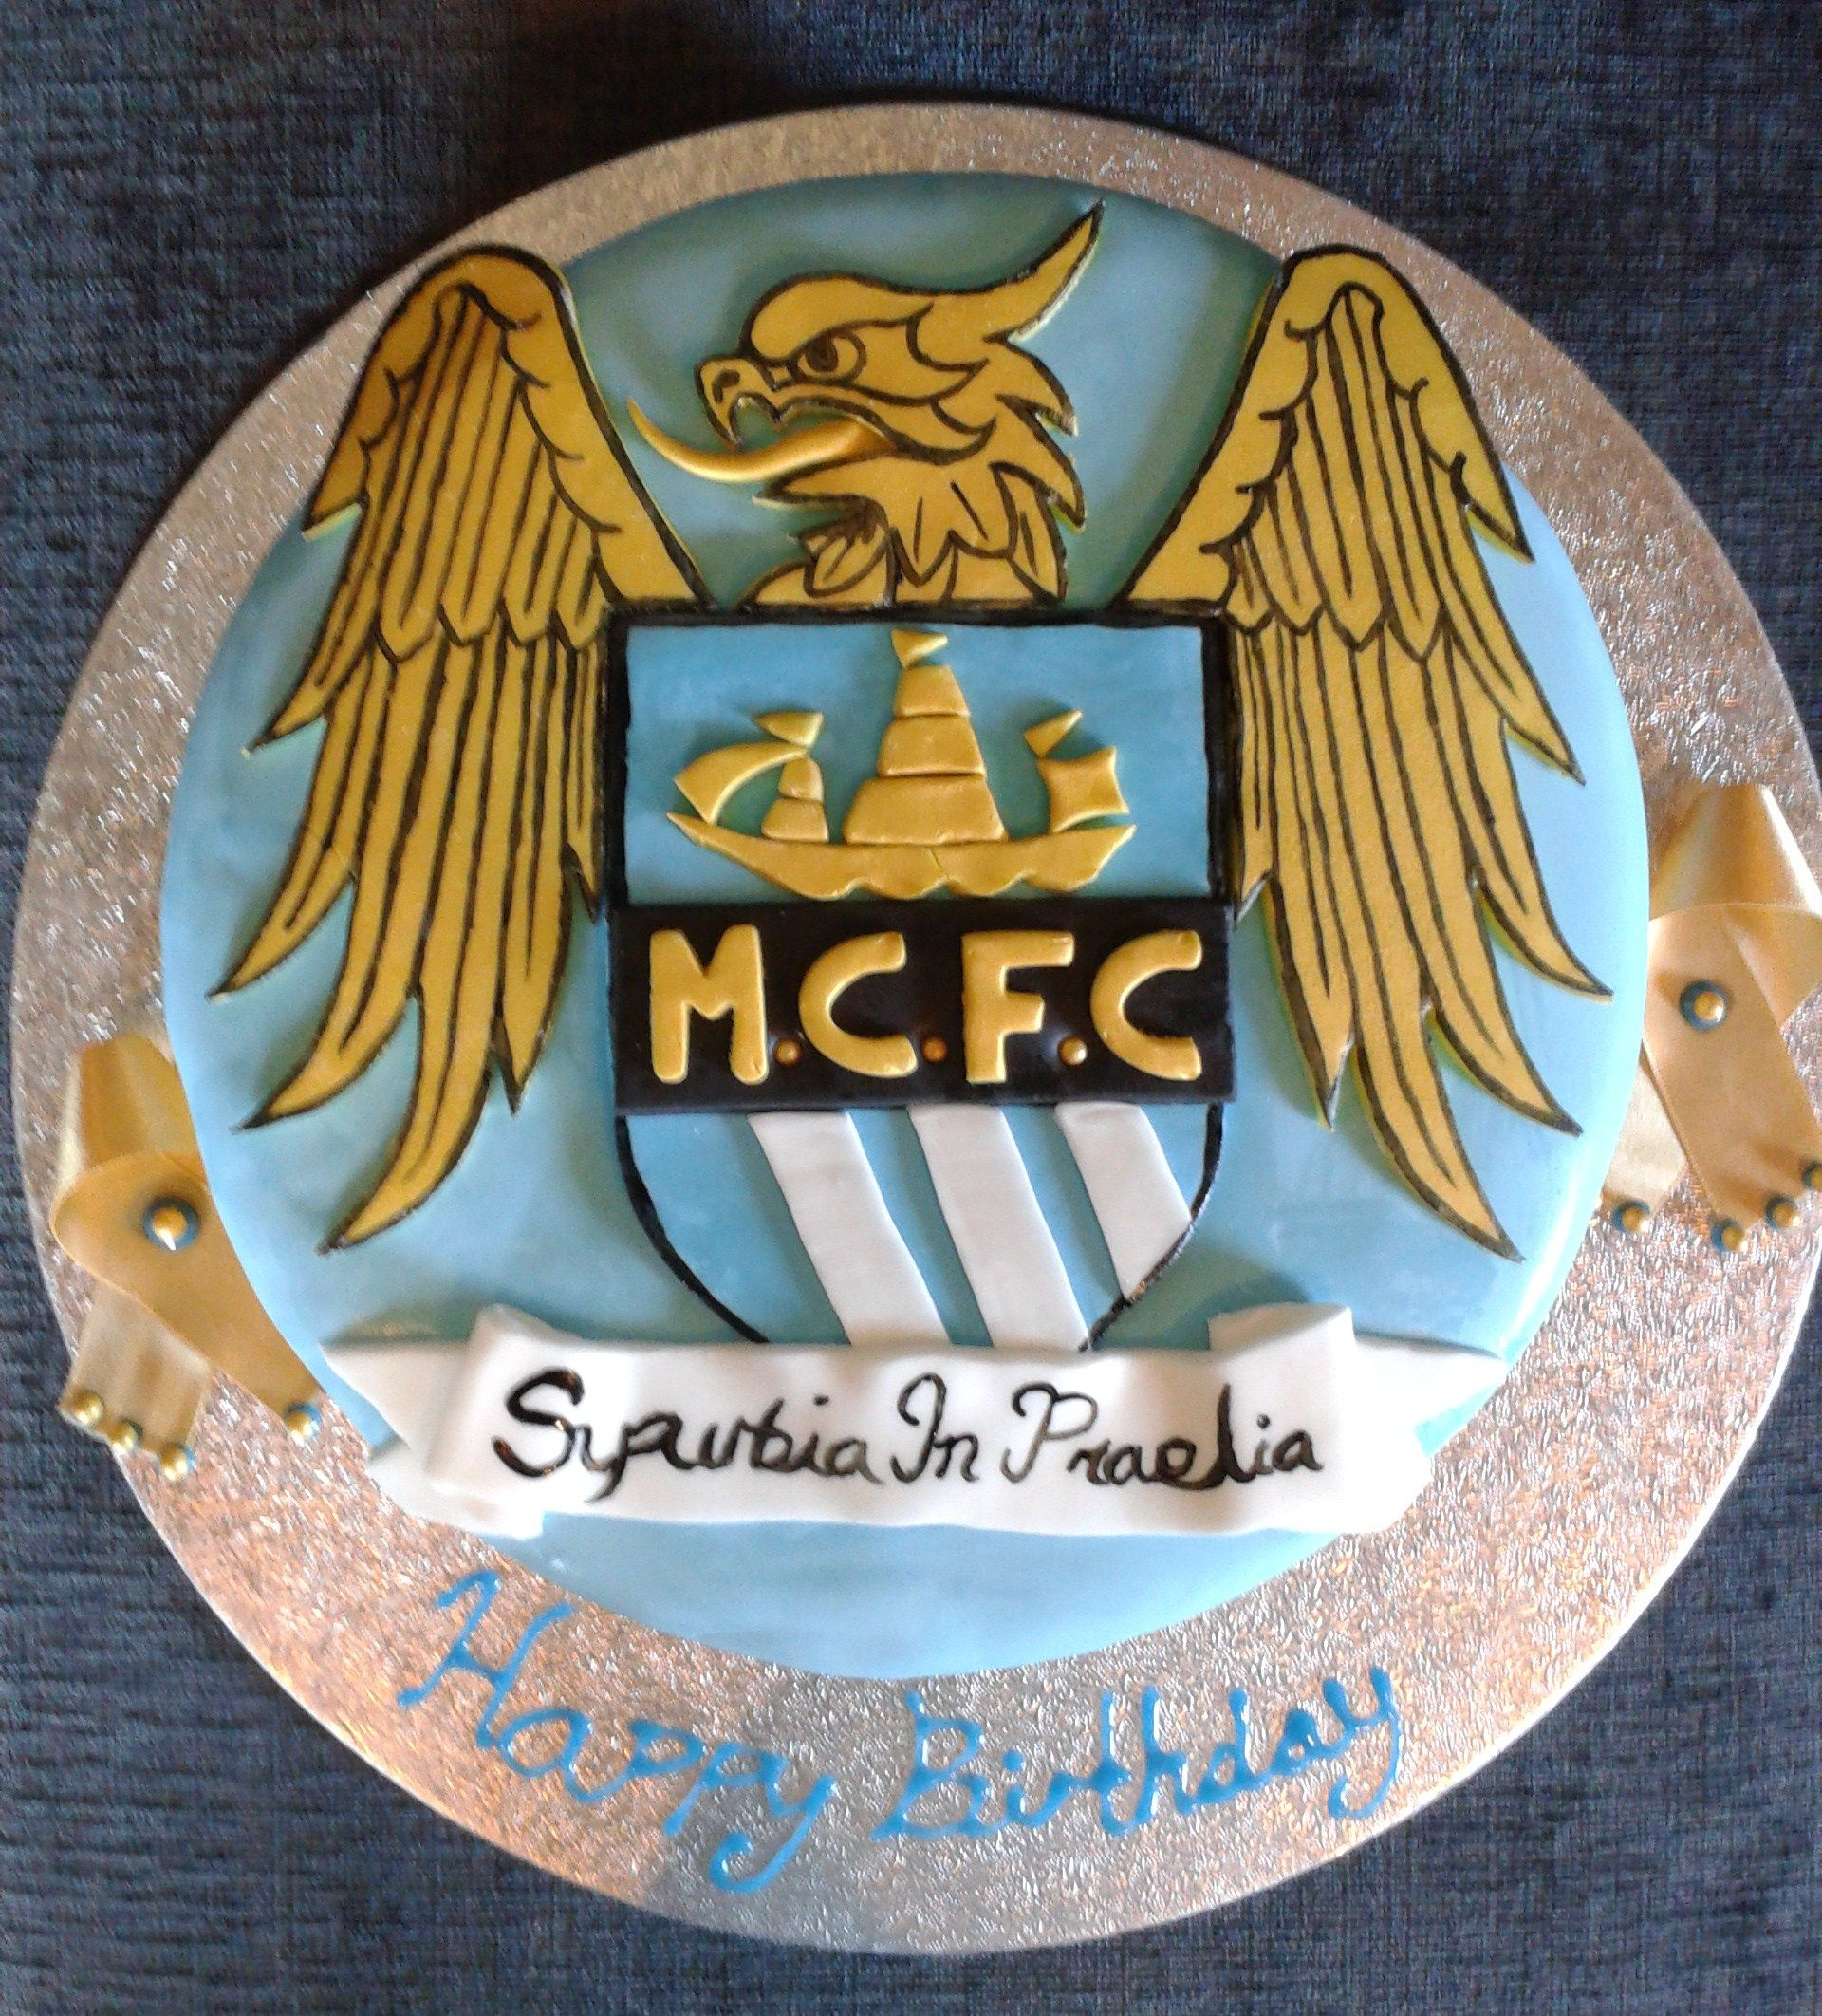 Manchester city Birthday cake by Fat rascal cake co Warrington www